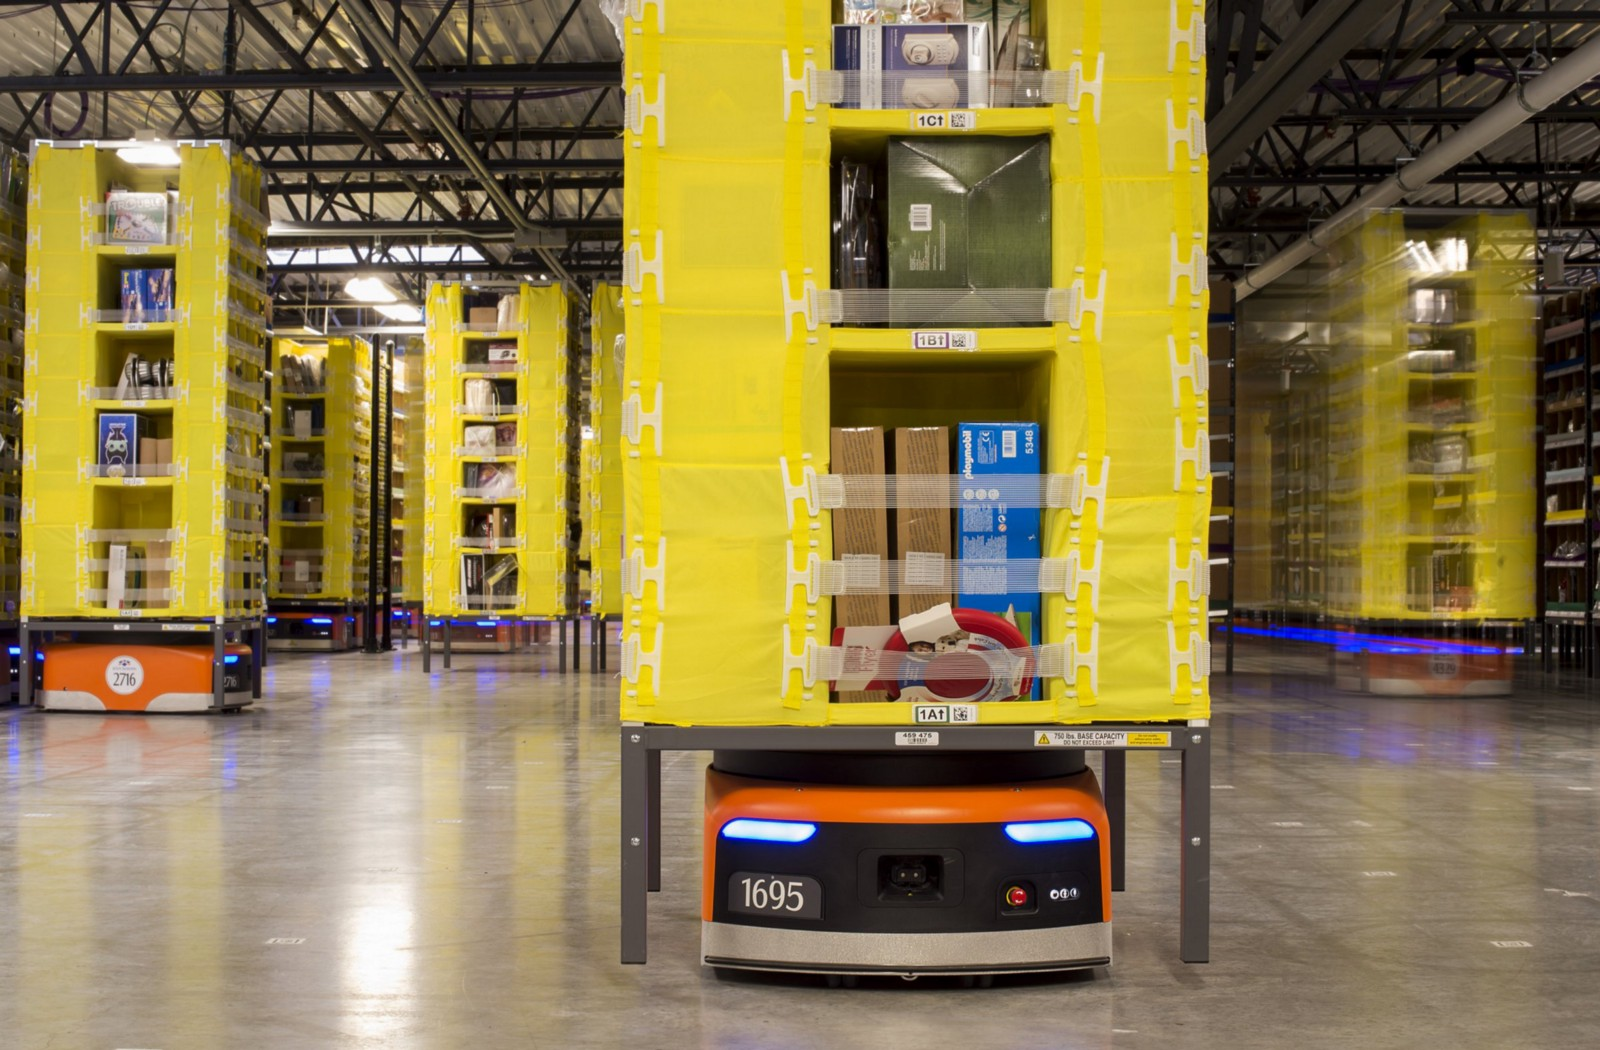 Amazon Robotics for order fulfillment